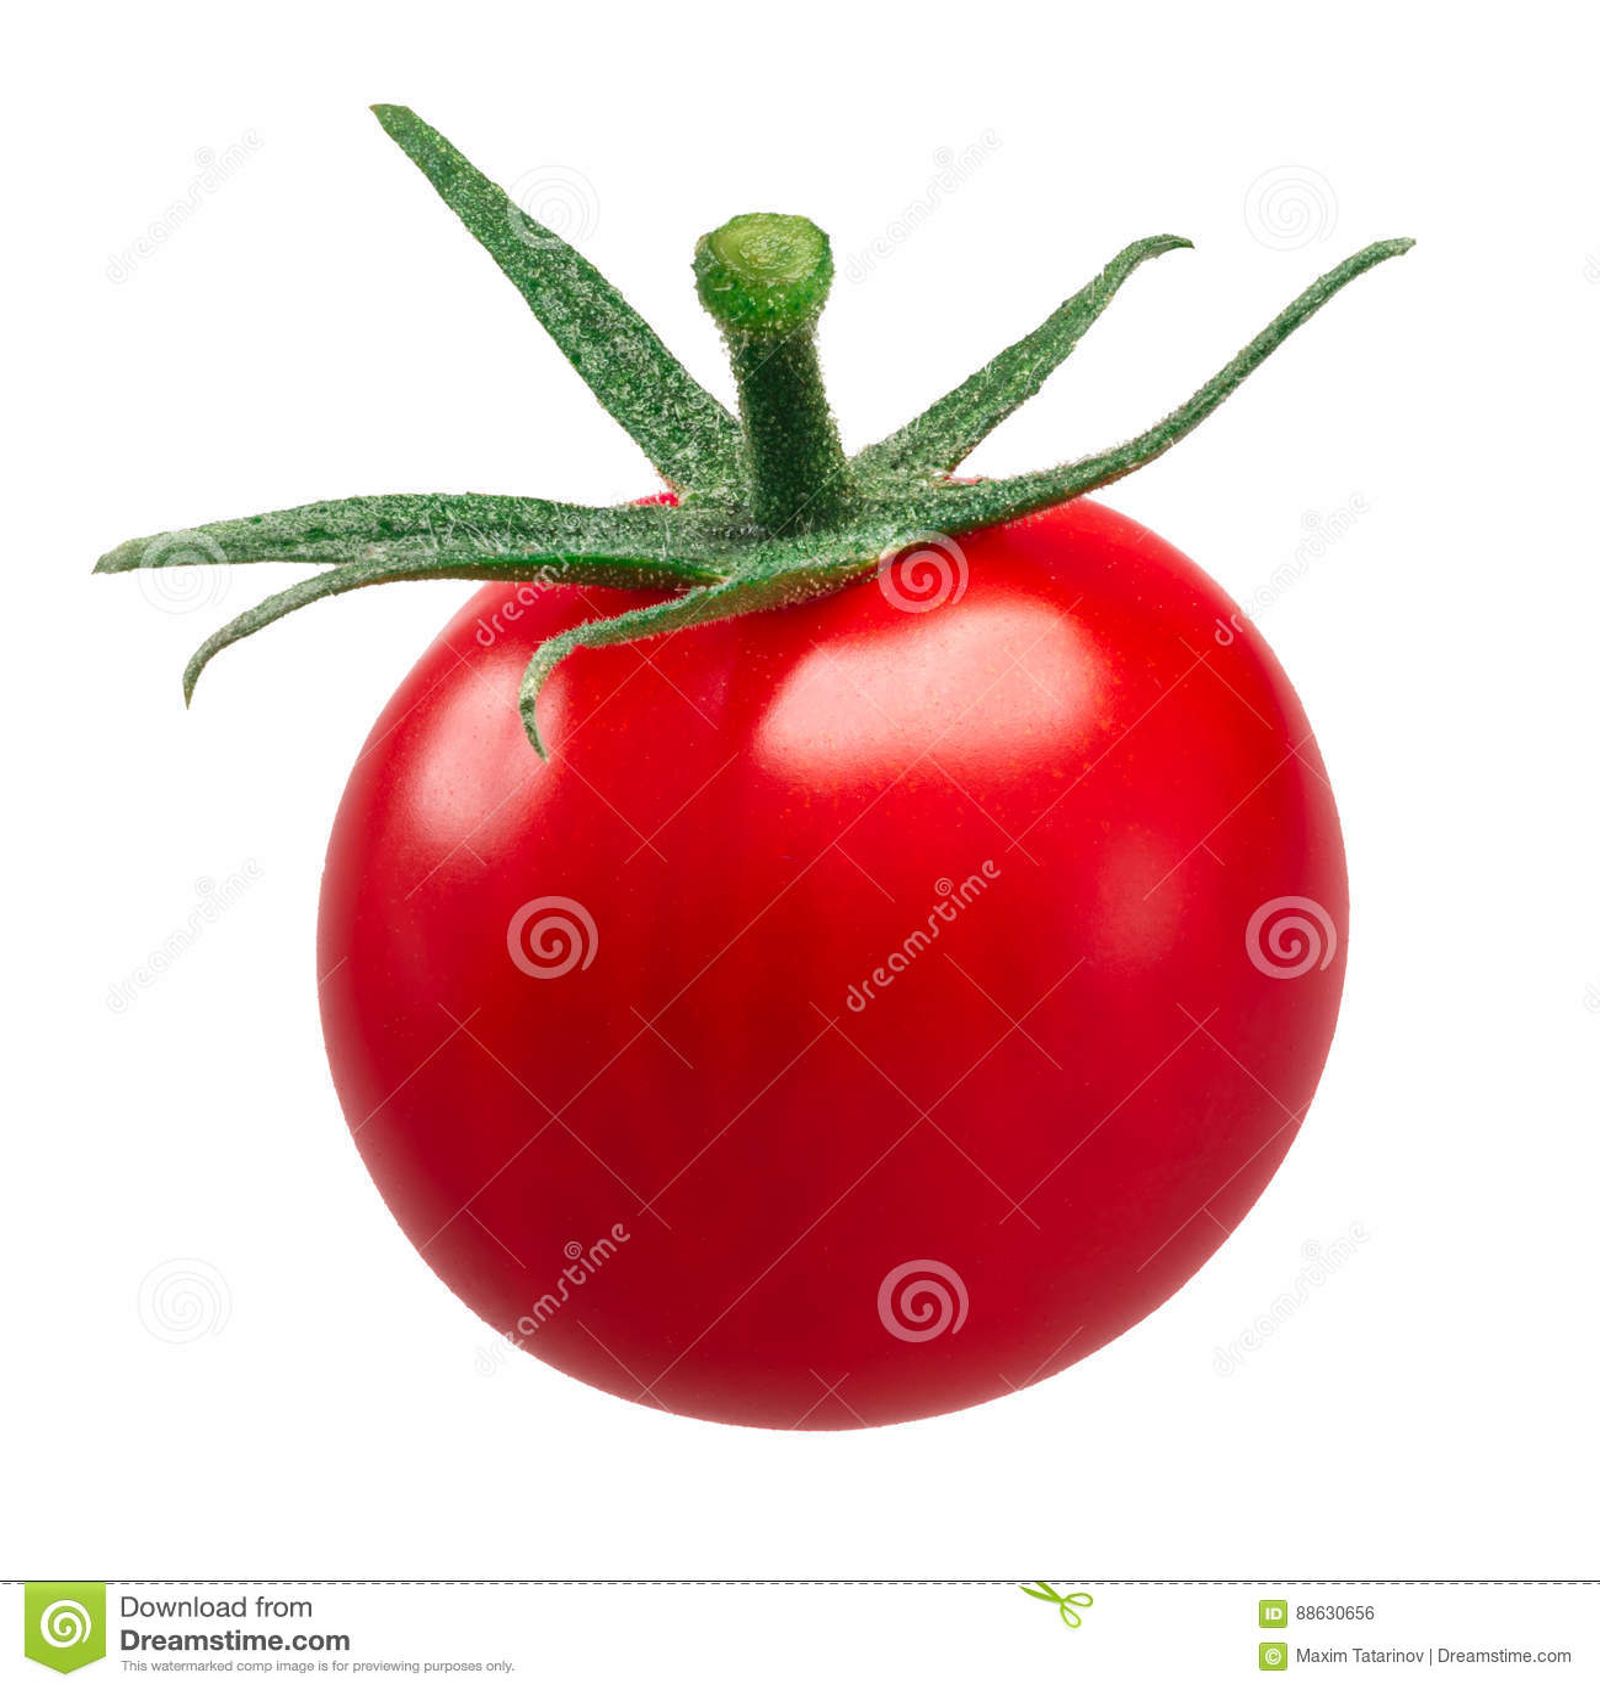 Cherry tomato, paths